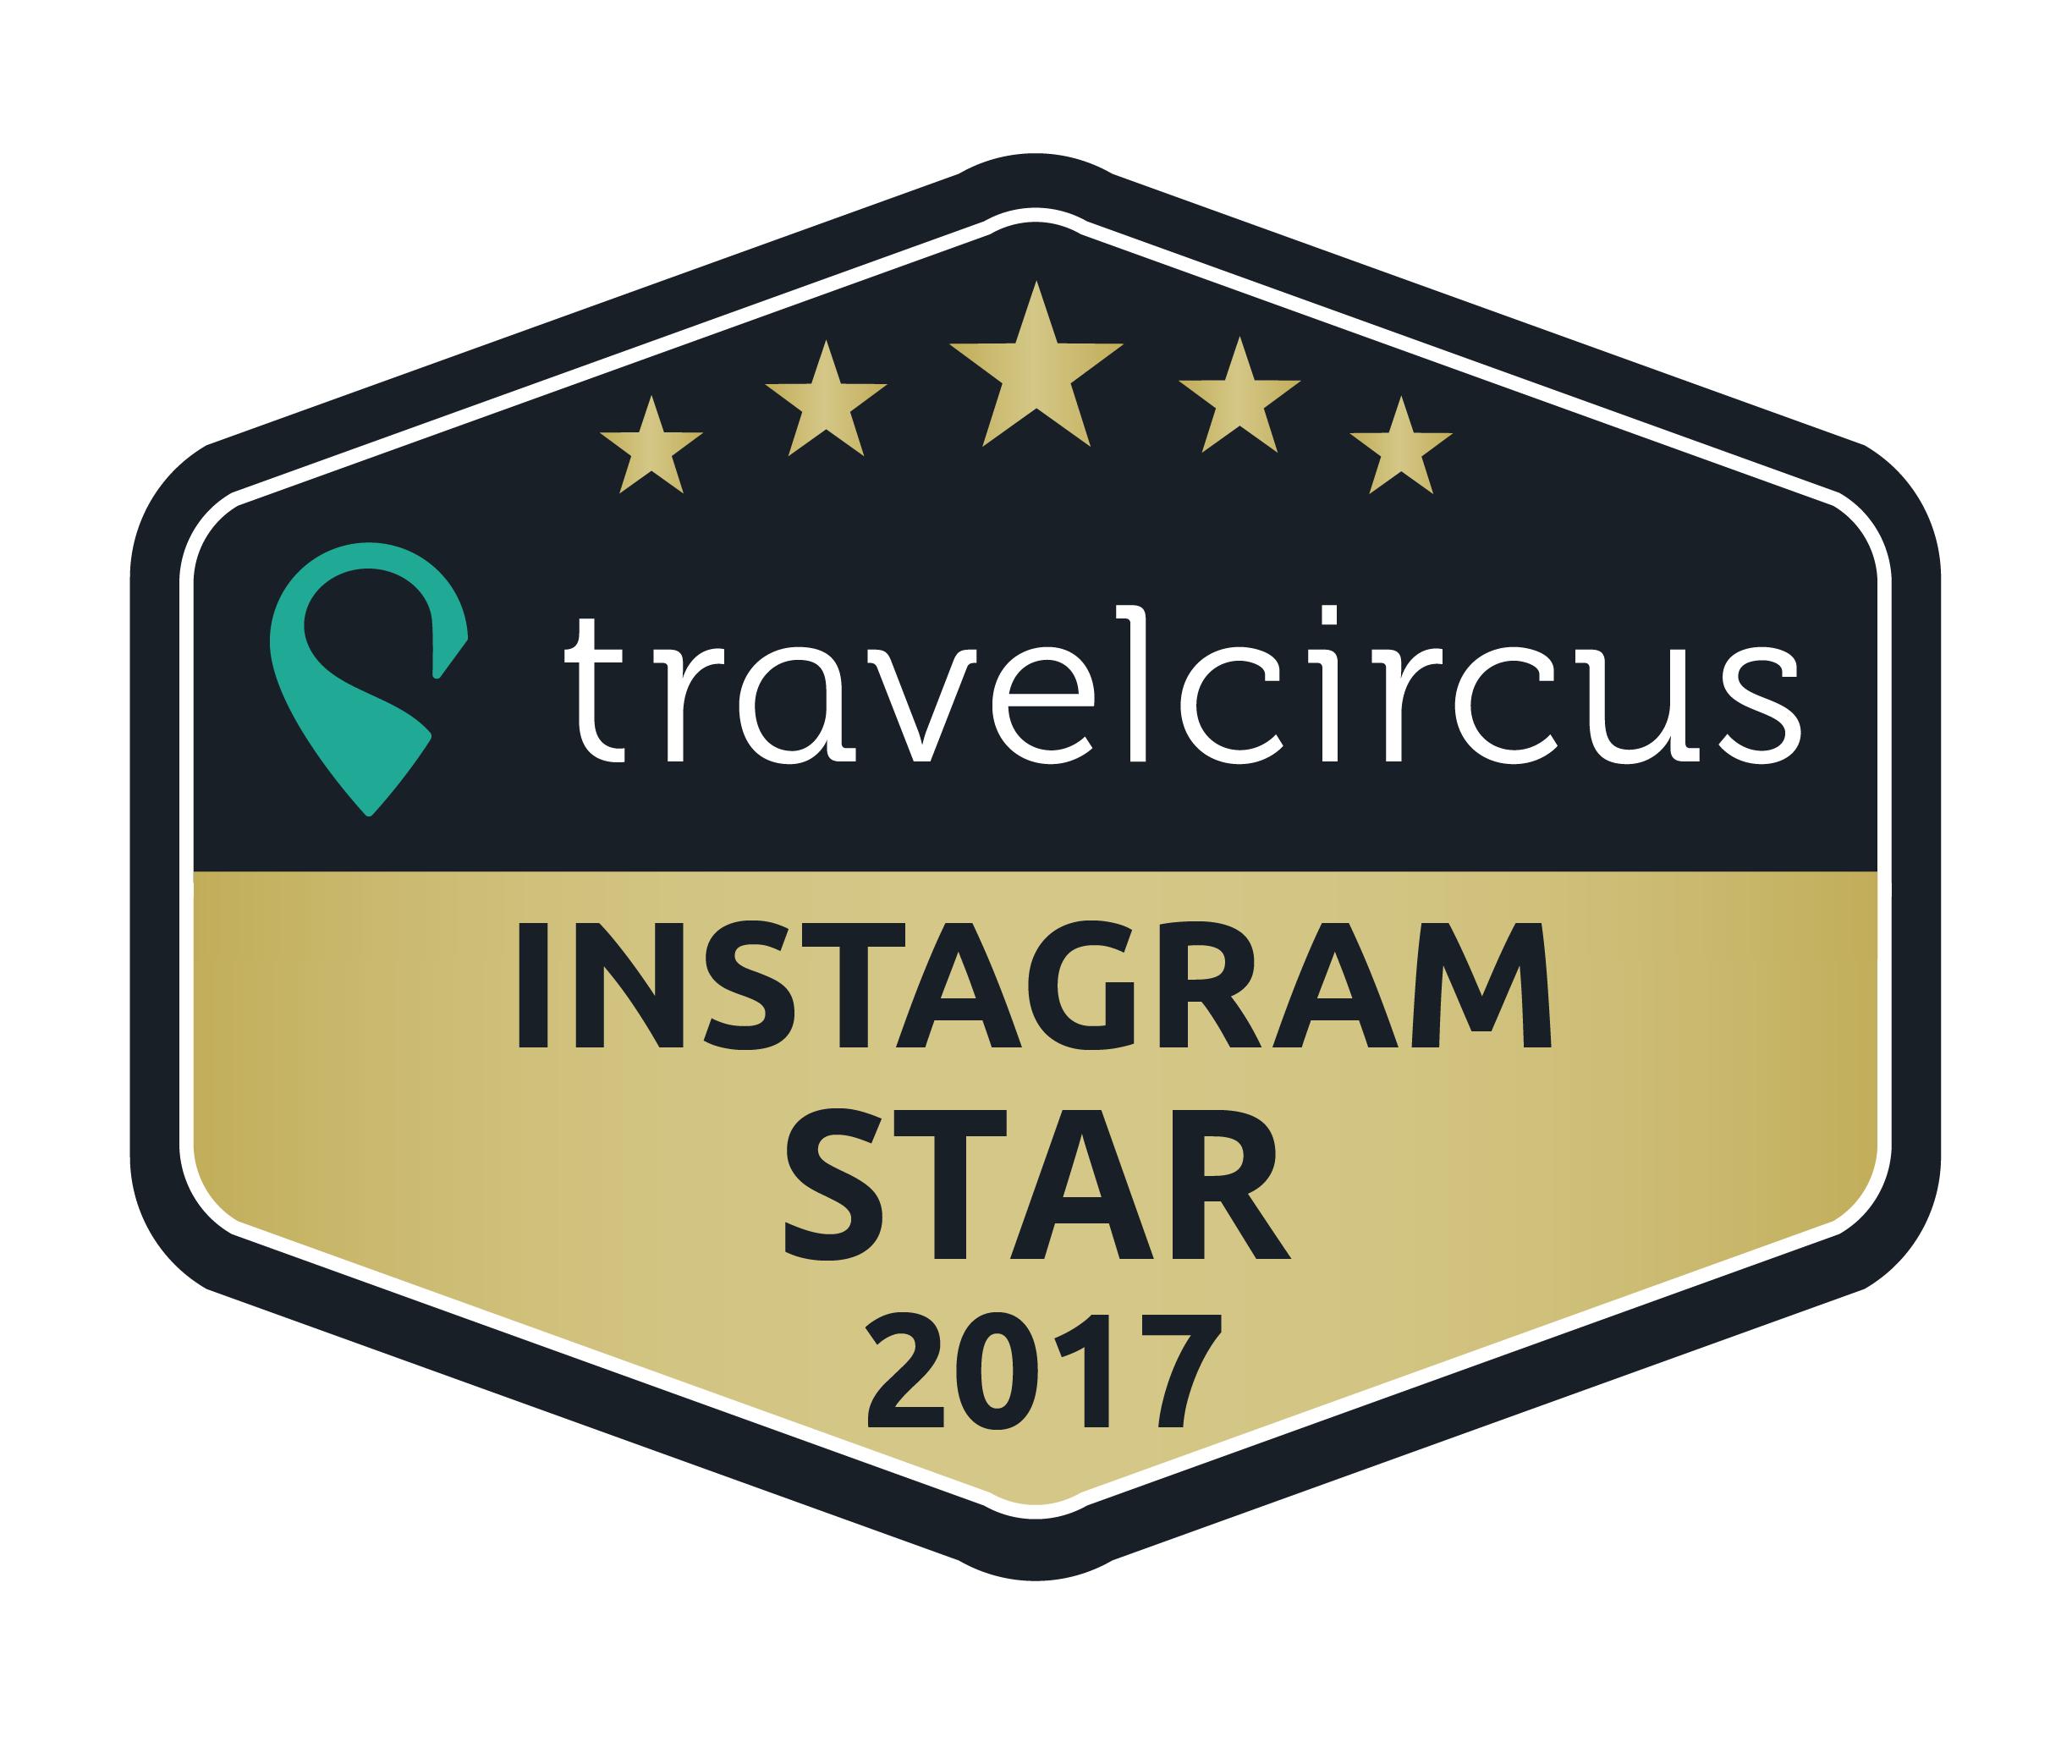 Instagram Star Award